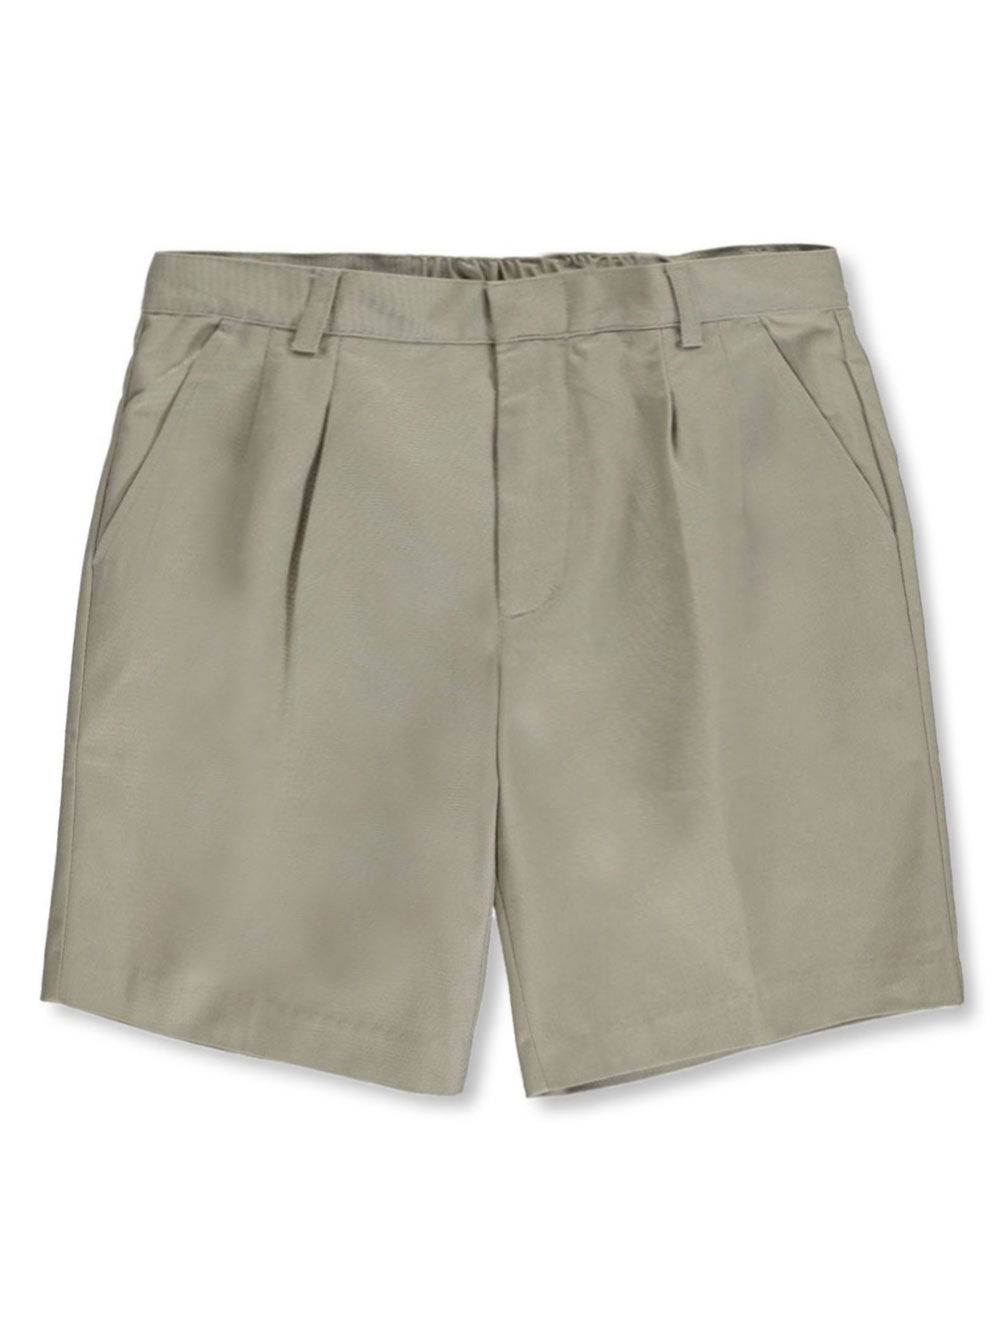 Universal Little Boys Toddler Basic Pleated Shorts